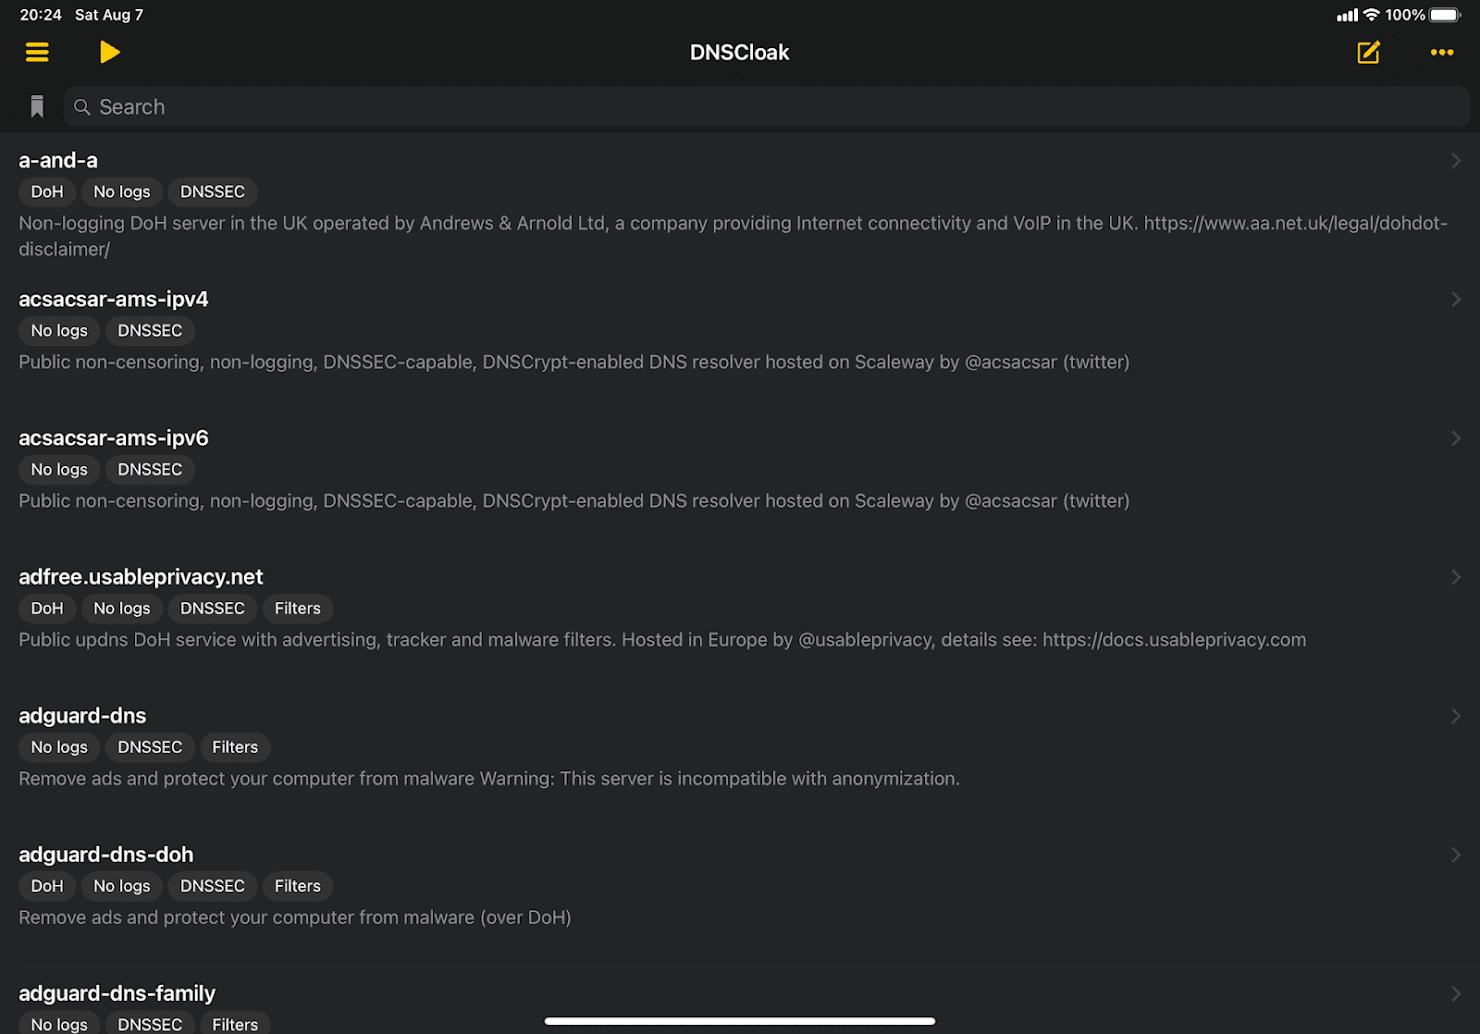 DNSCloakのメイン画面